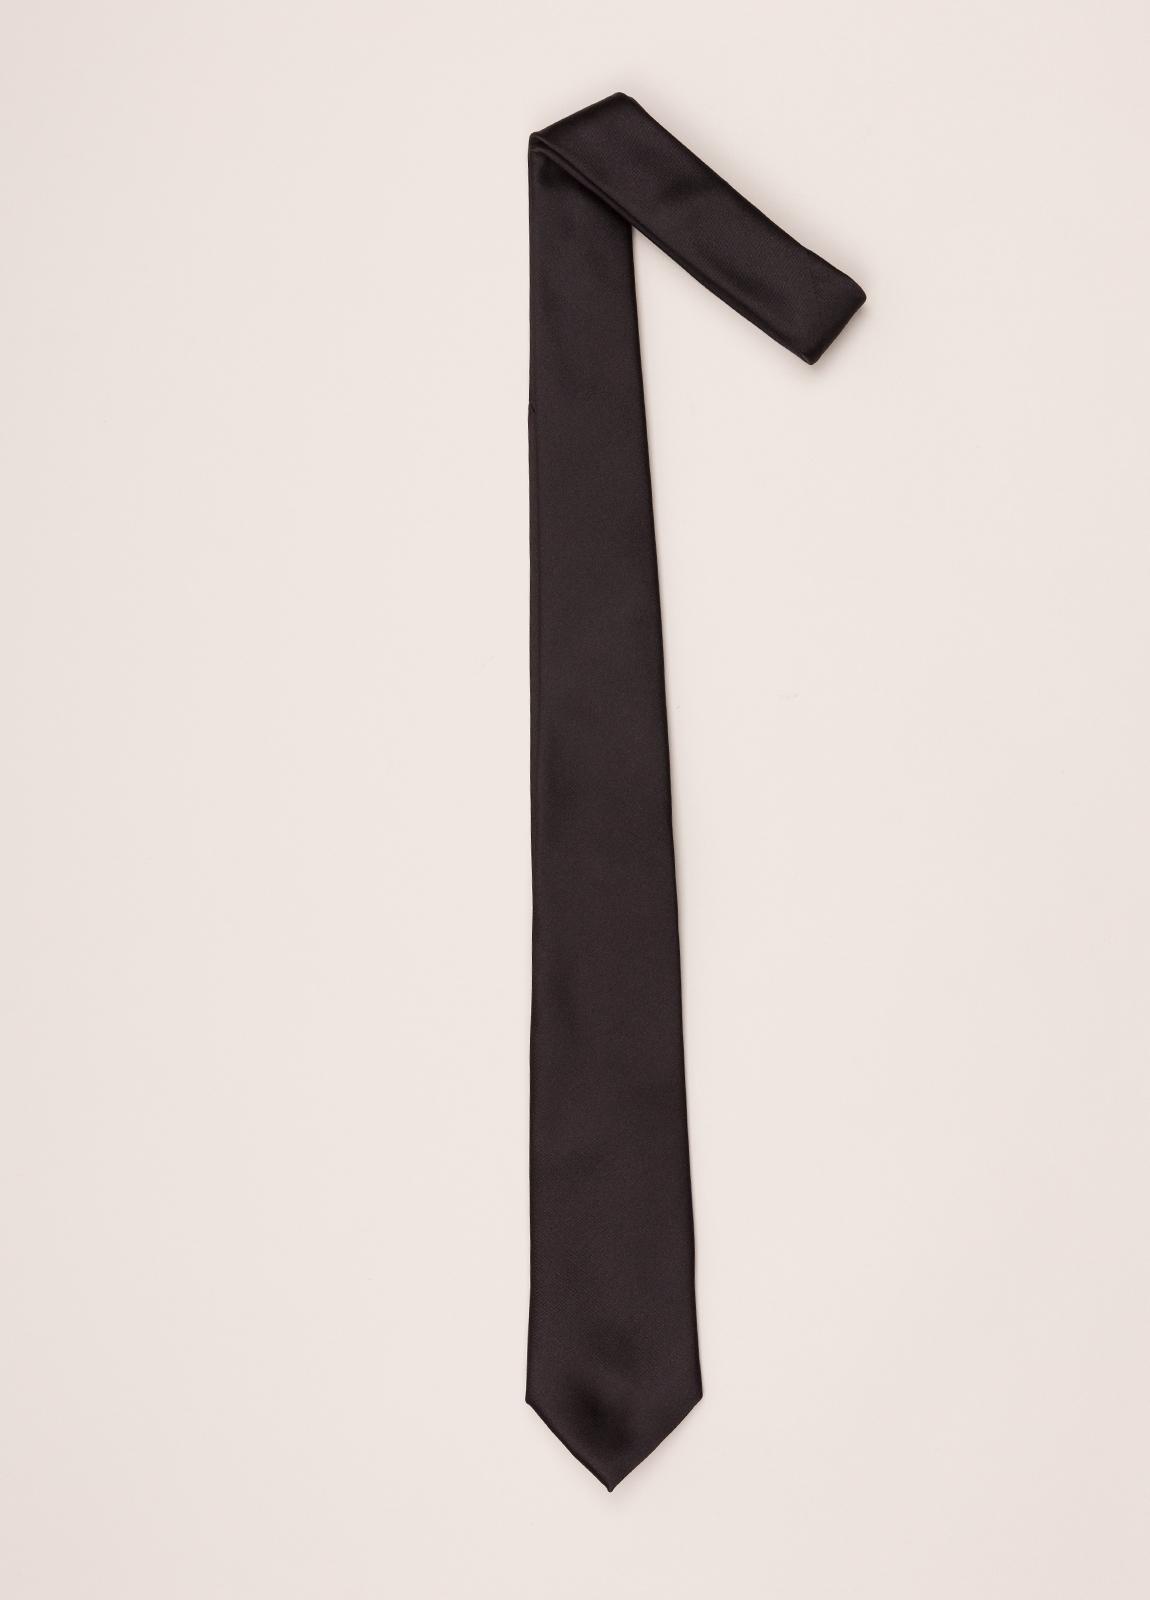 Corbata FUREST COLECCIÓN negro liso - Ítem1